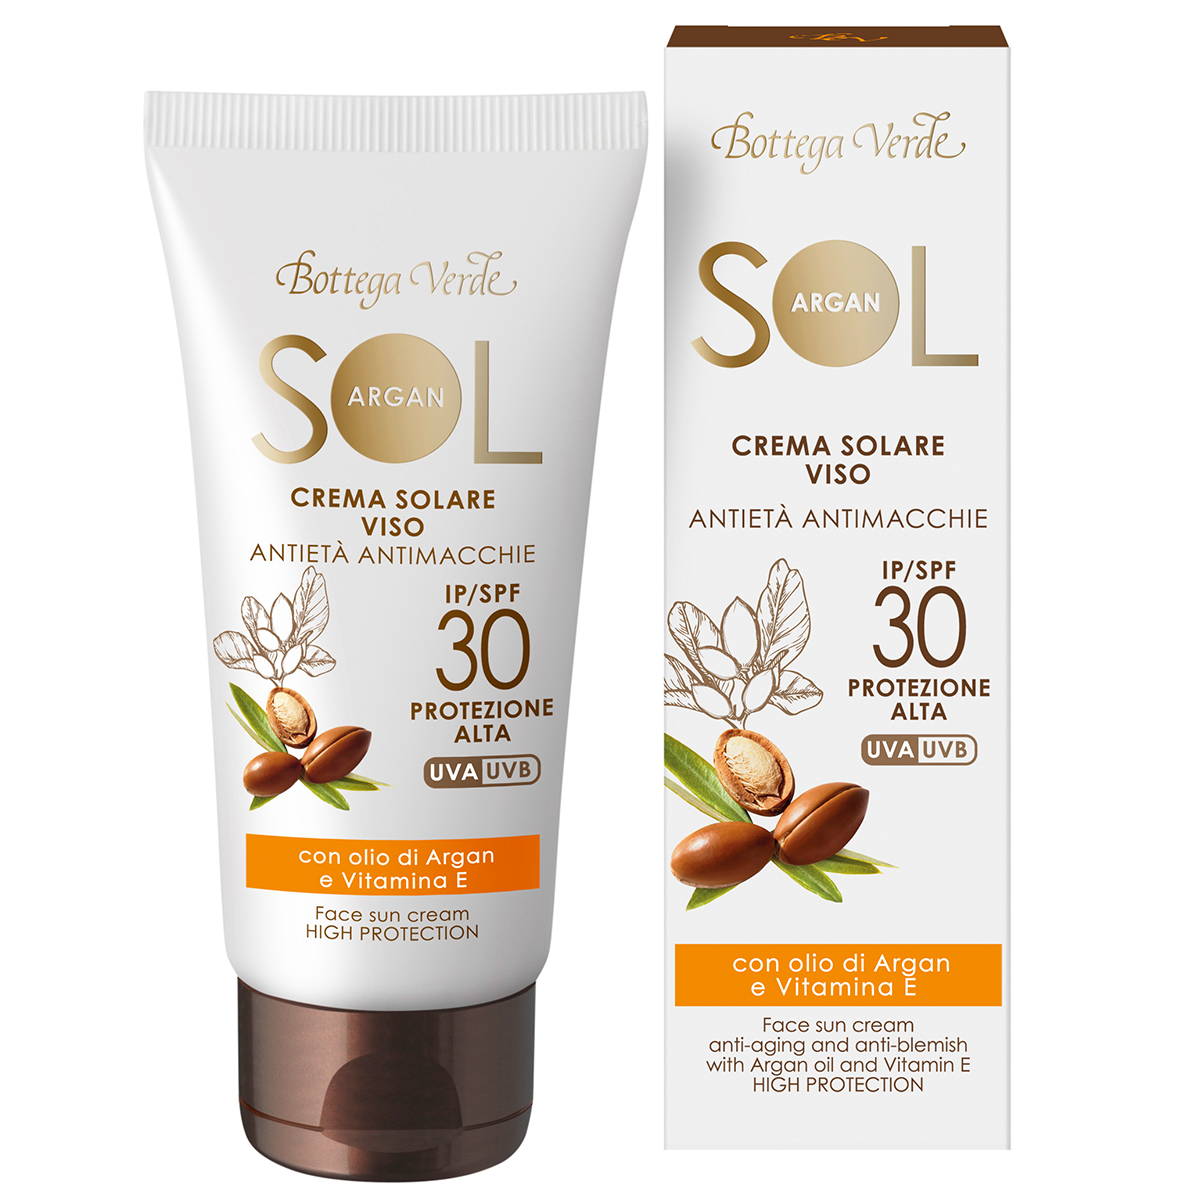 Protectie Solara - Crema De Fata Pentru Plaja Cu Efect Anti-imbatranire  Anti-pata - Cu Ulei De Argan Si Vitamina E - Spf30